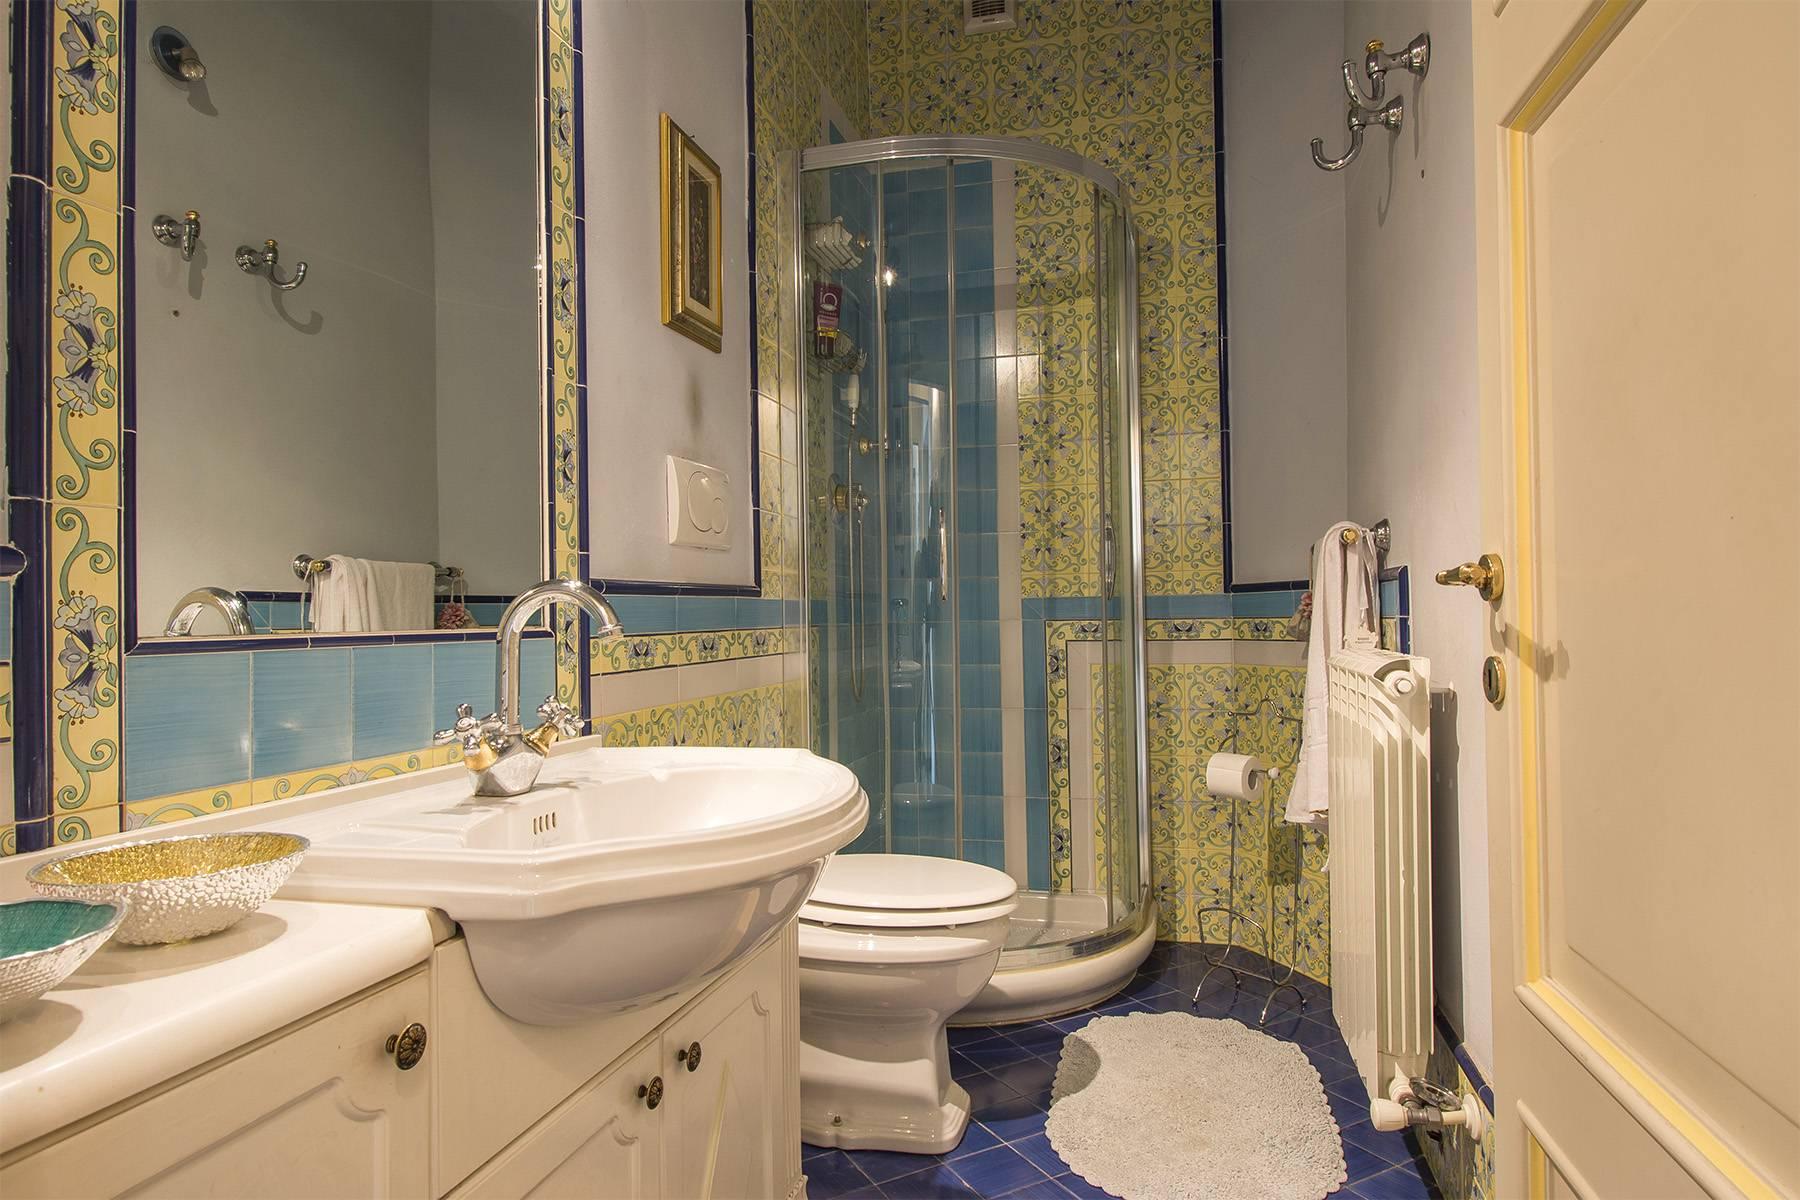 Villa in Vendita a Lucca: 5 locali, 350 mq - Foto 12